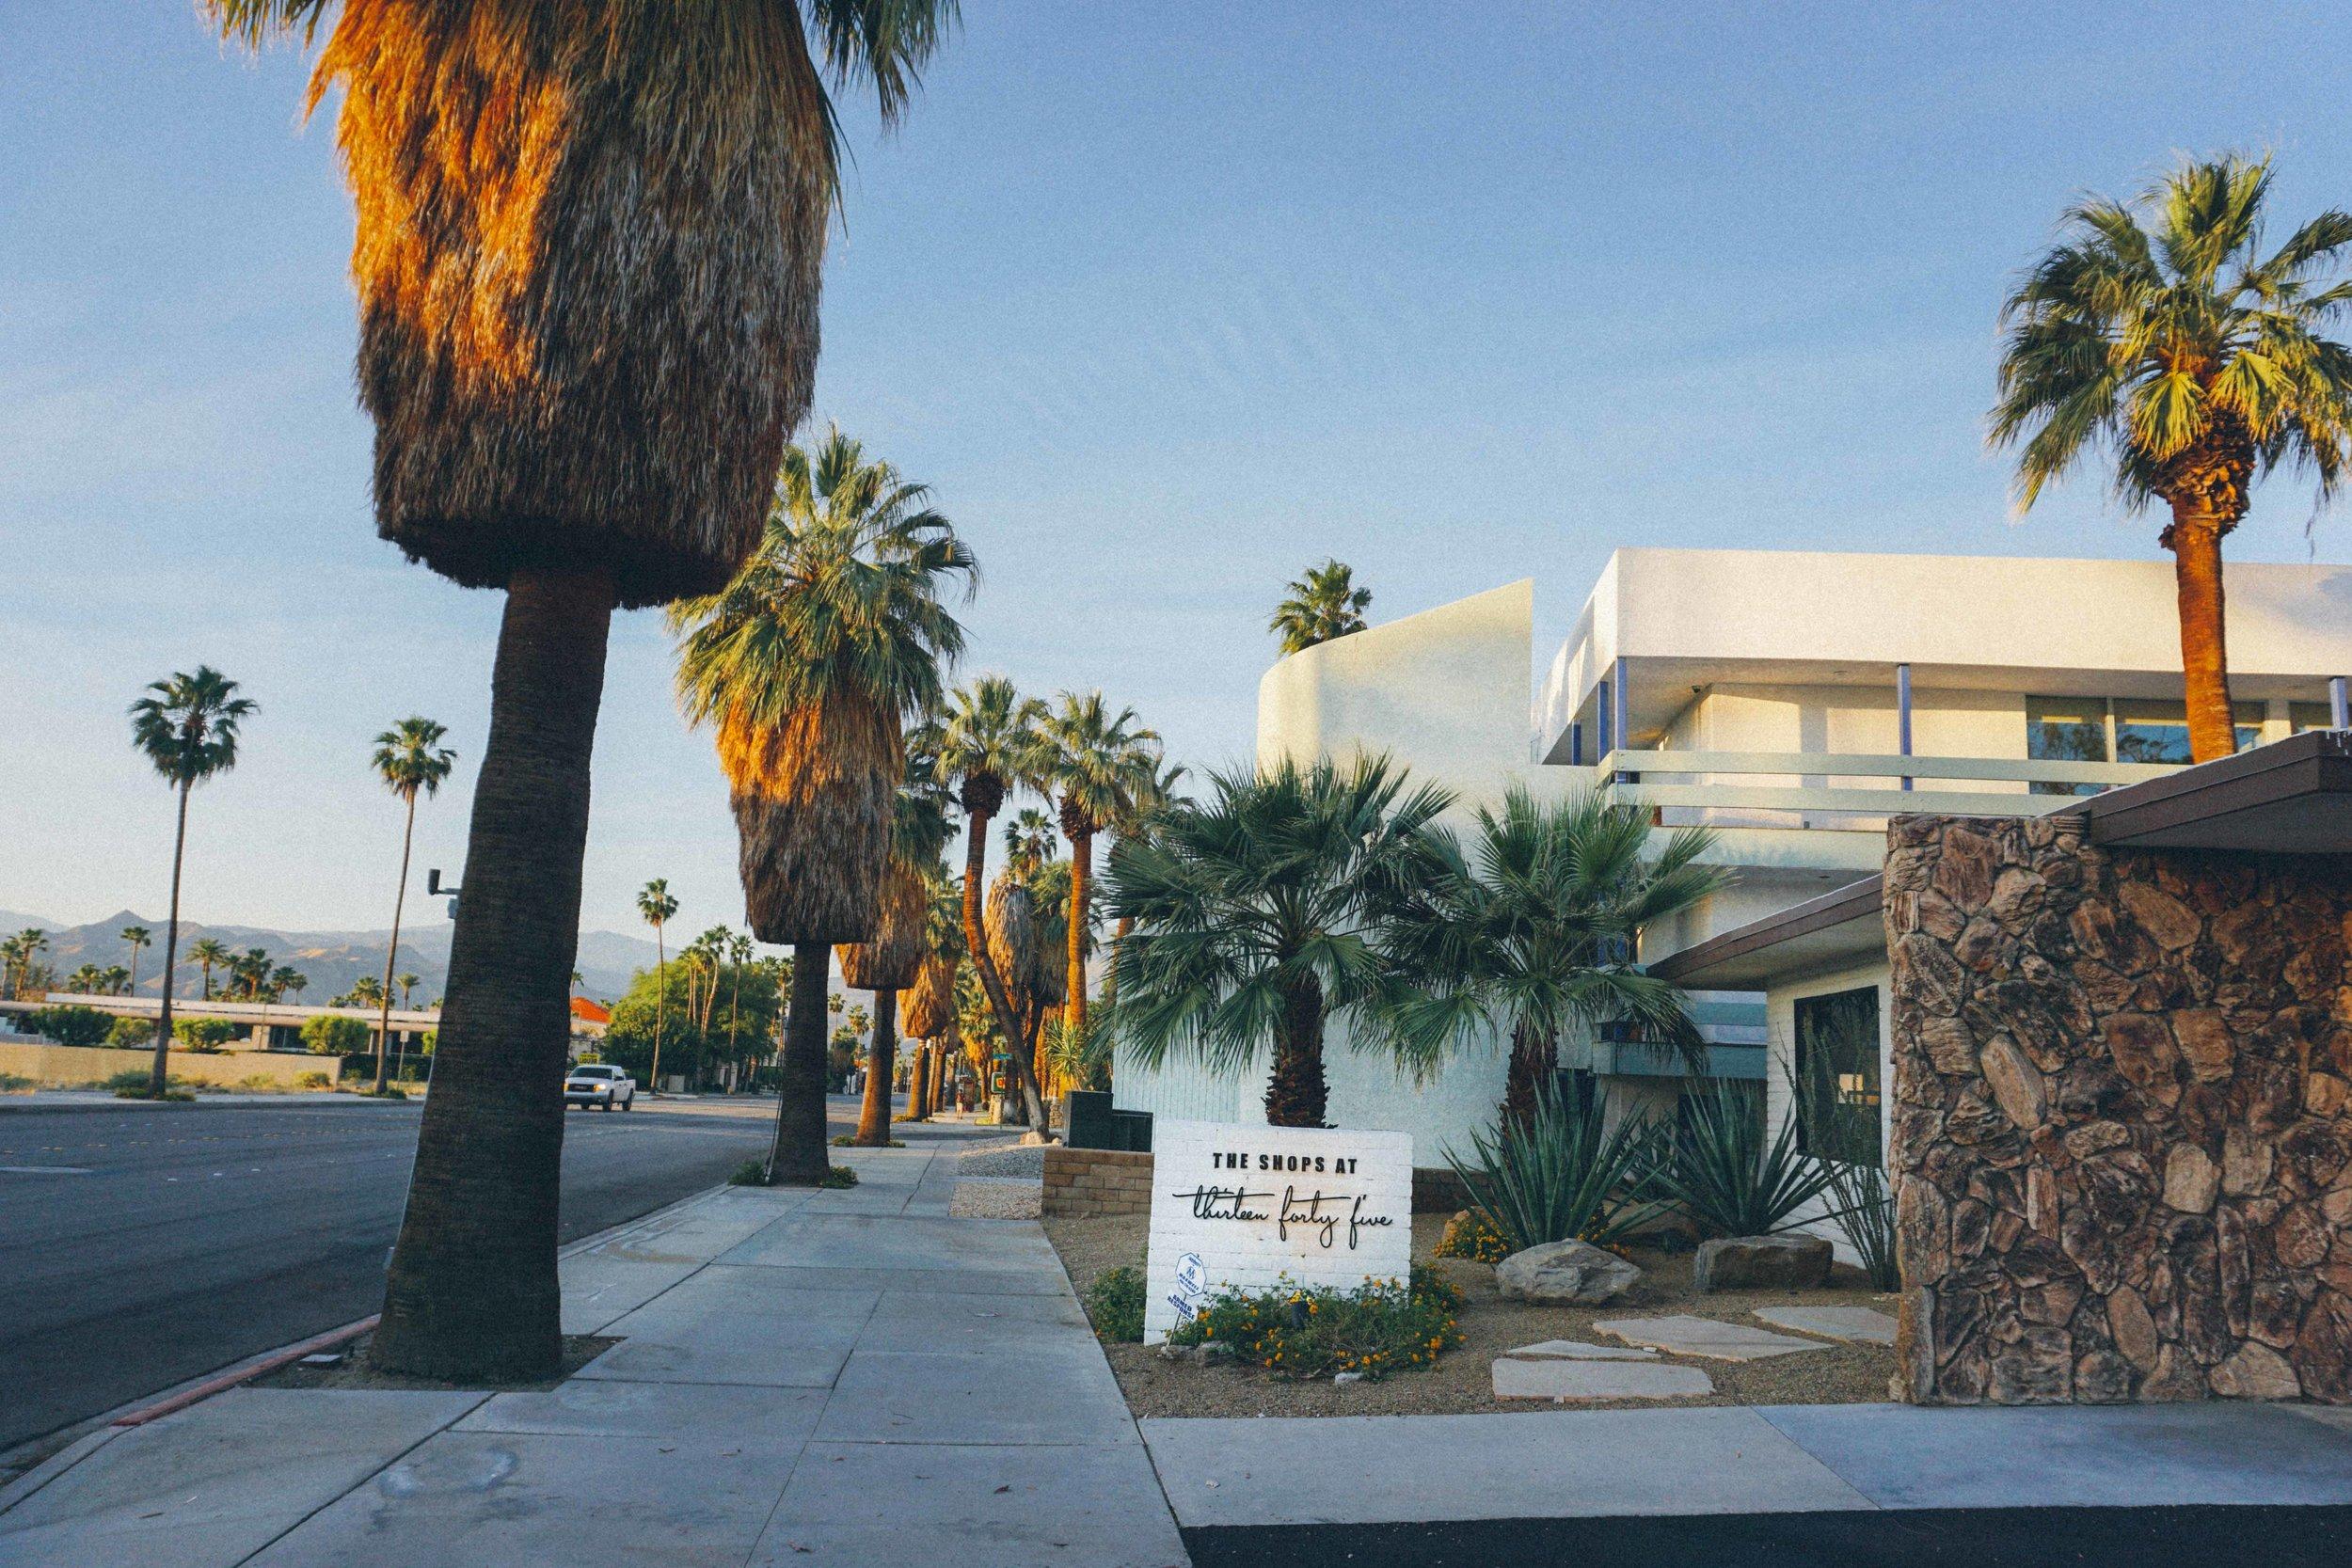 Palm Springs Hotel, Coachella Festival